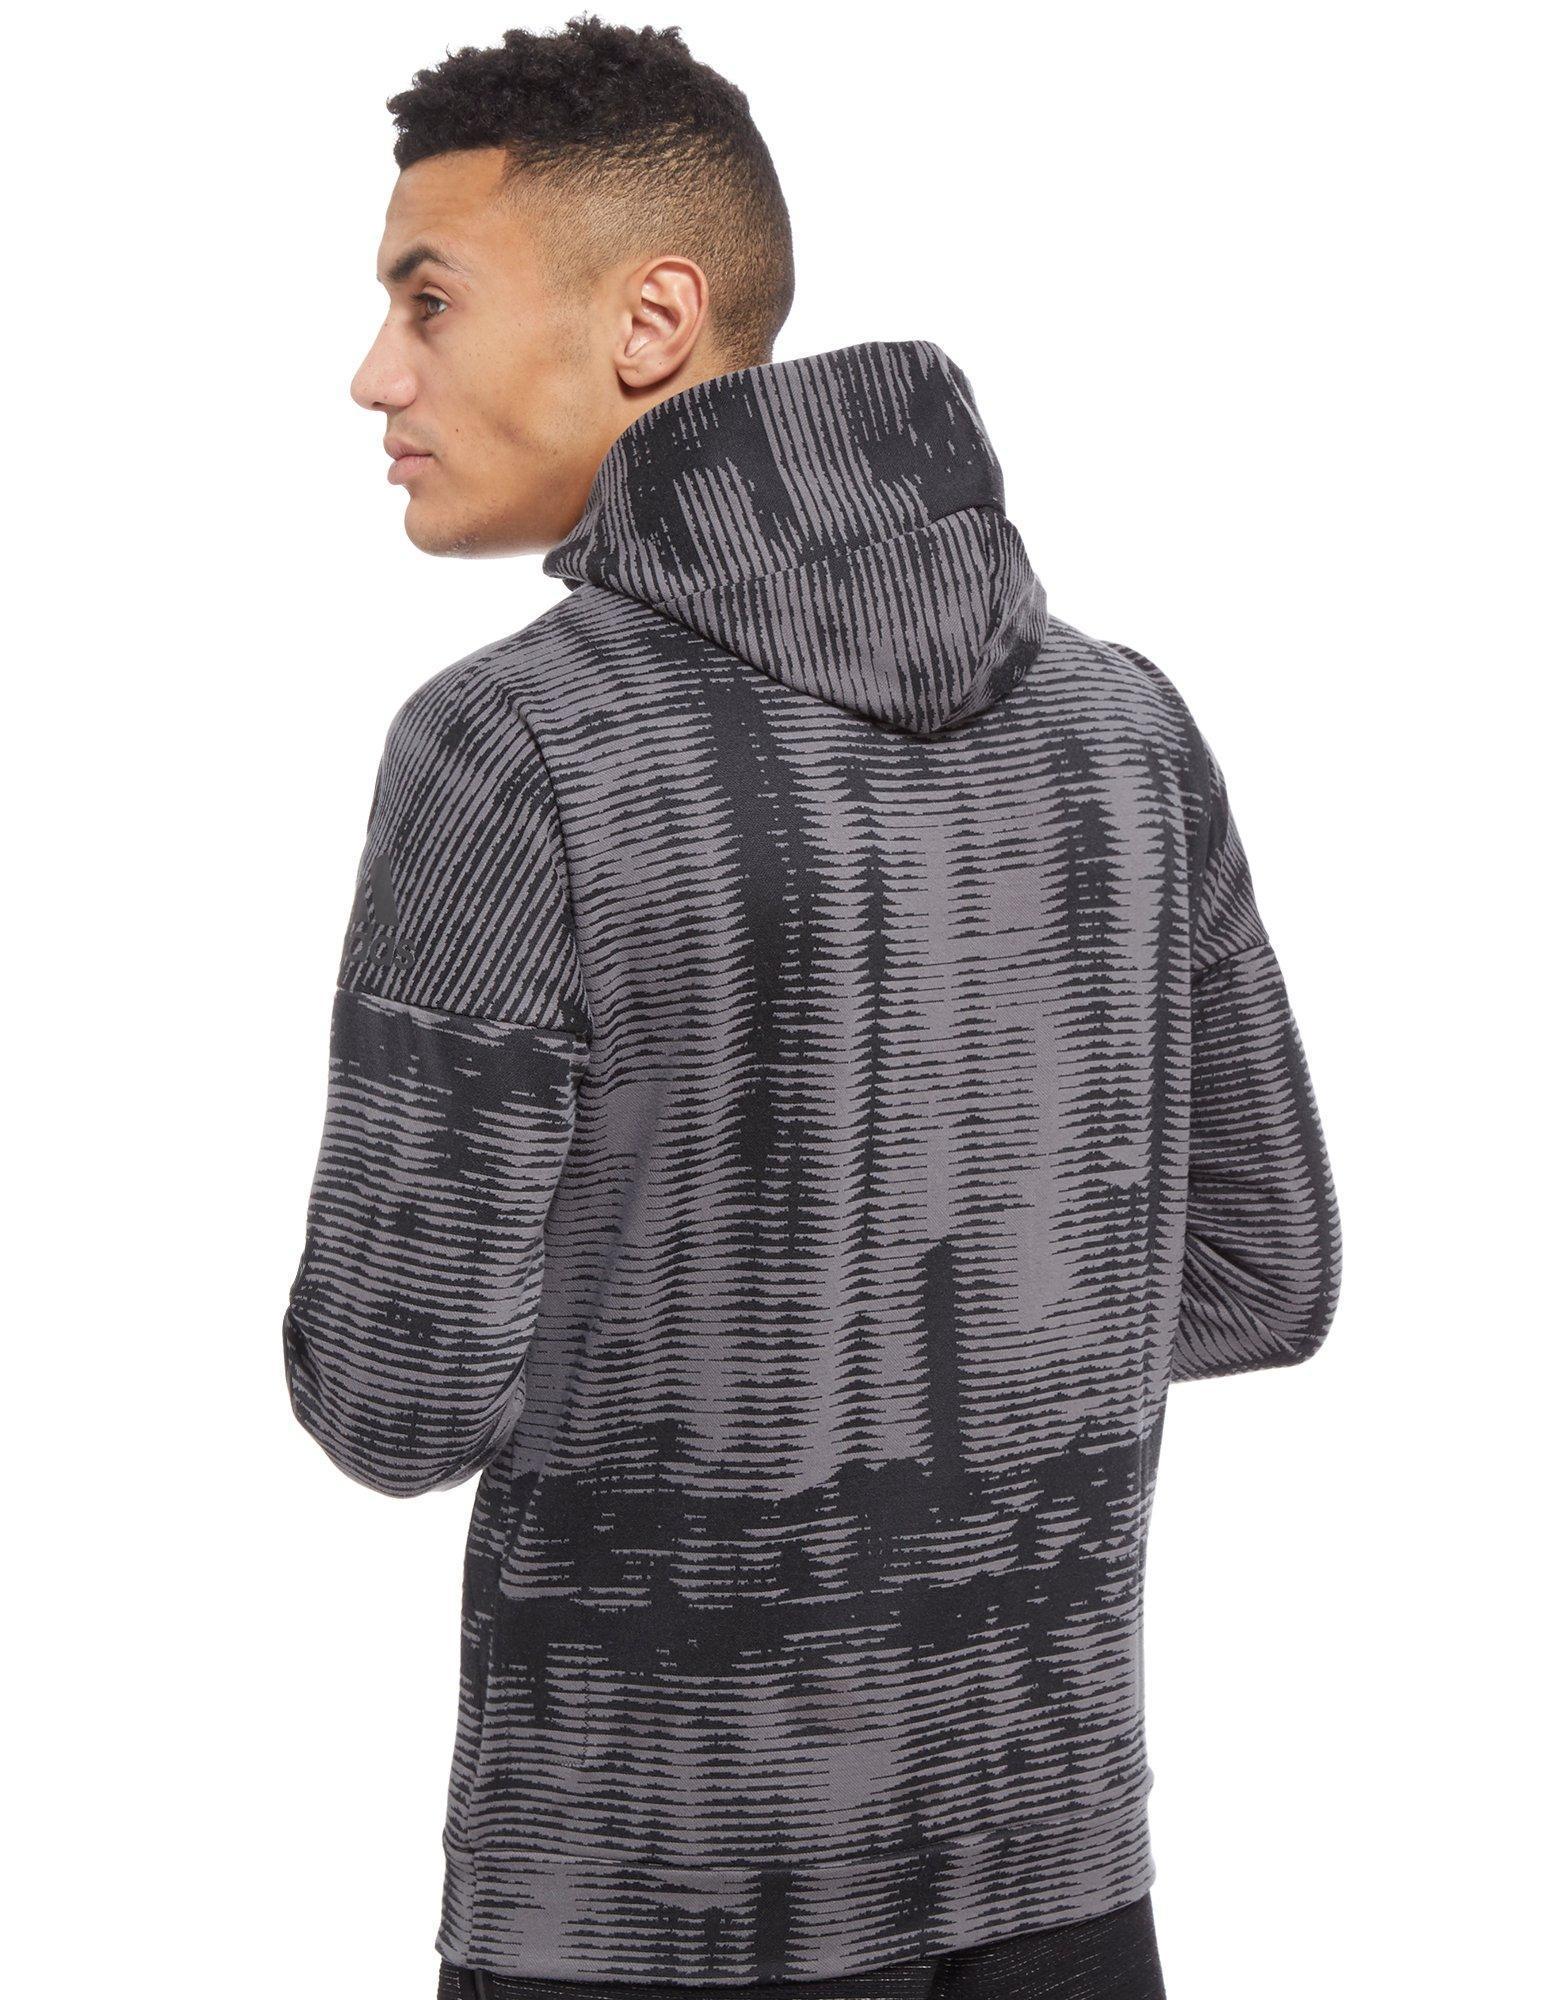 adidas Cotton Zne Pulse Hoodie in Black/Grey (Grey) for Men